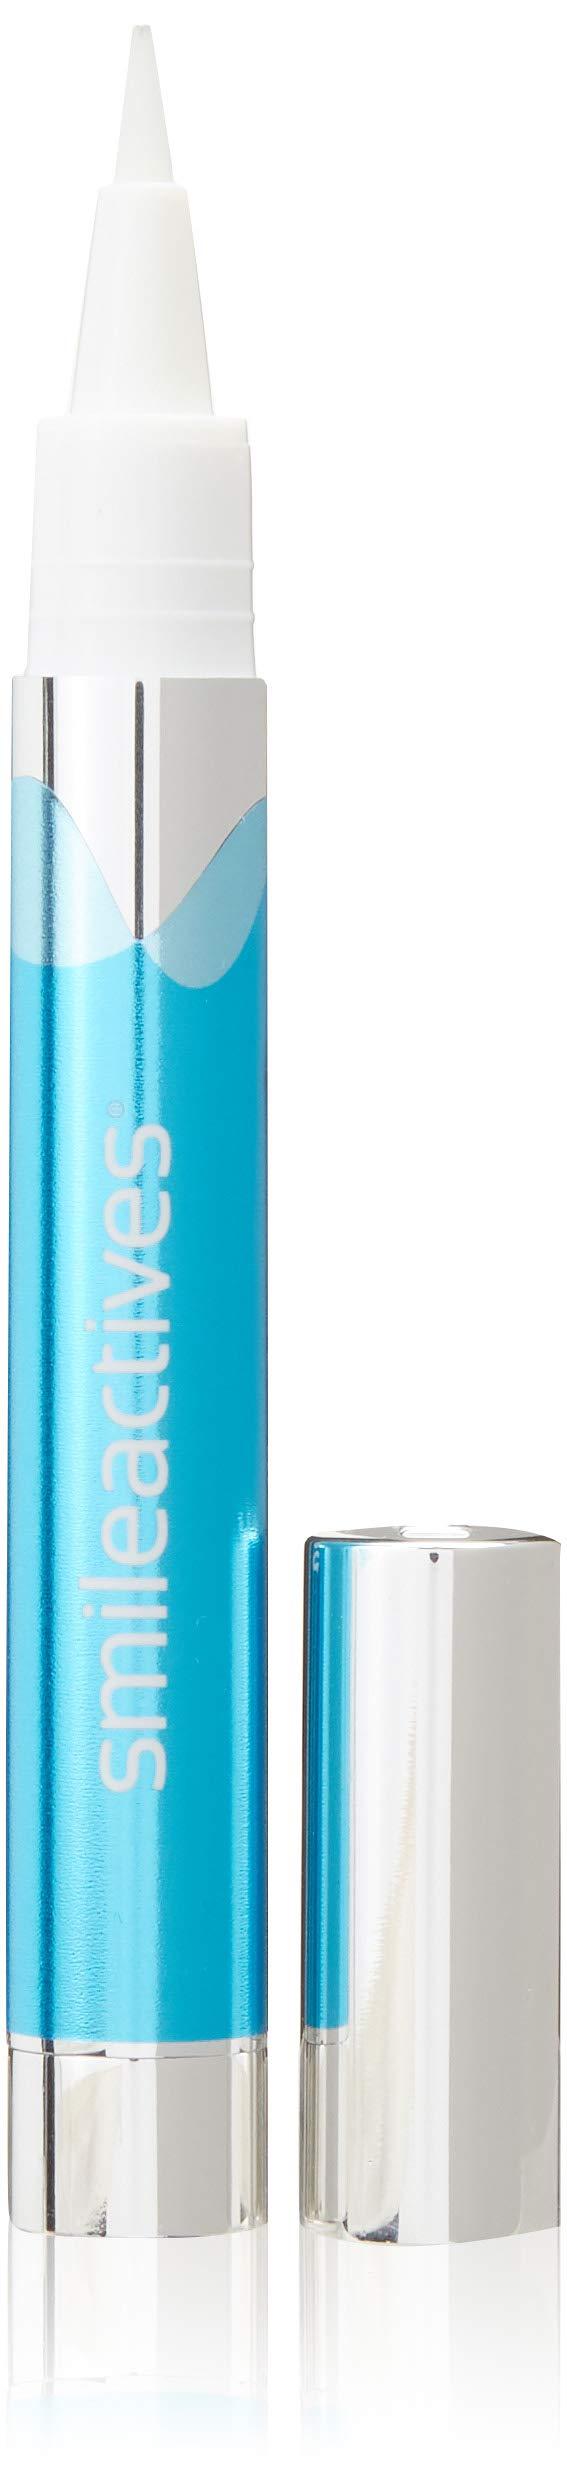 Amazon.com : Smileactives - Advanced Teeth Whitening Pen